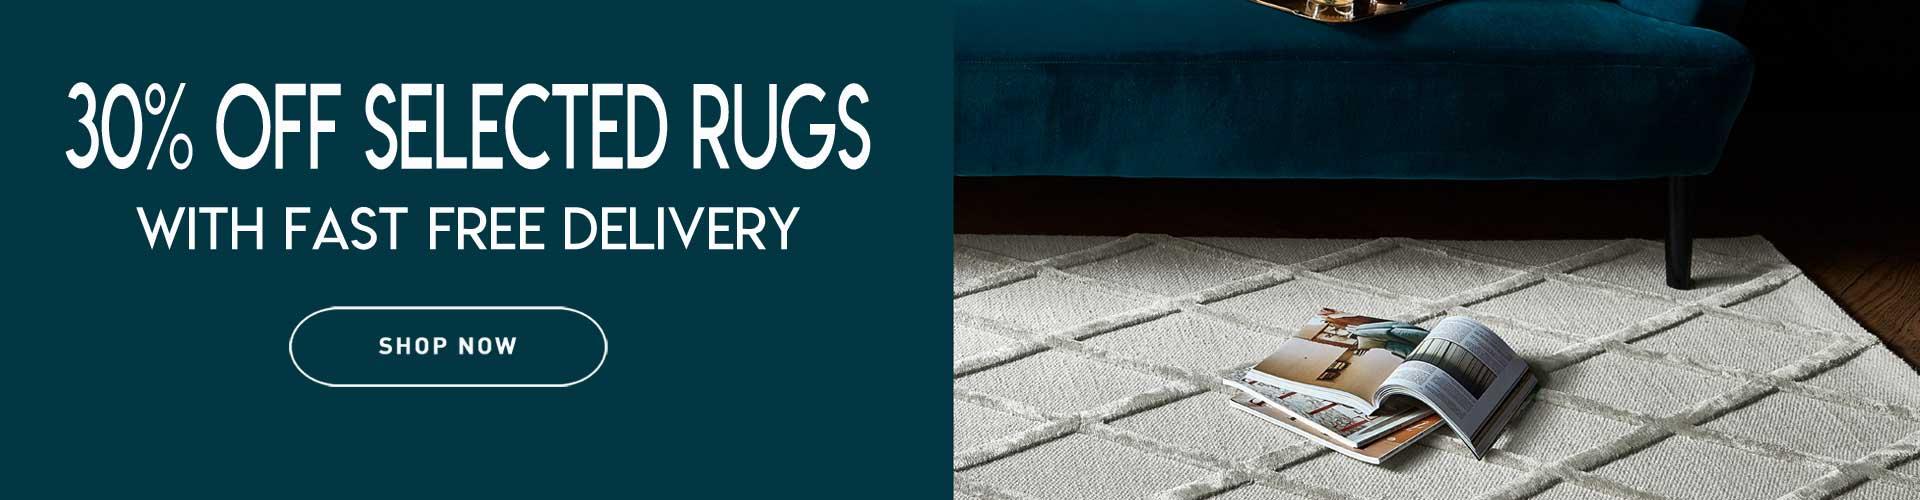 rug sale now on